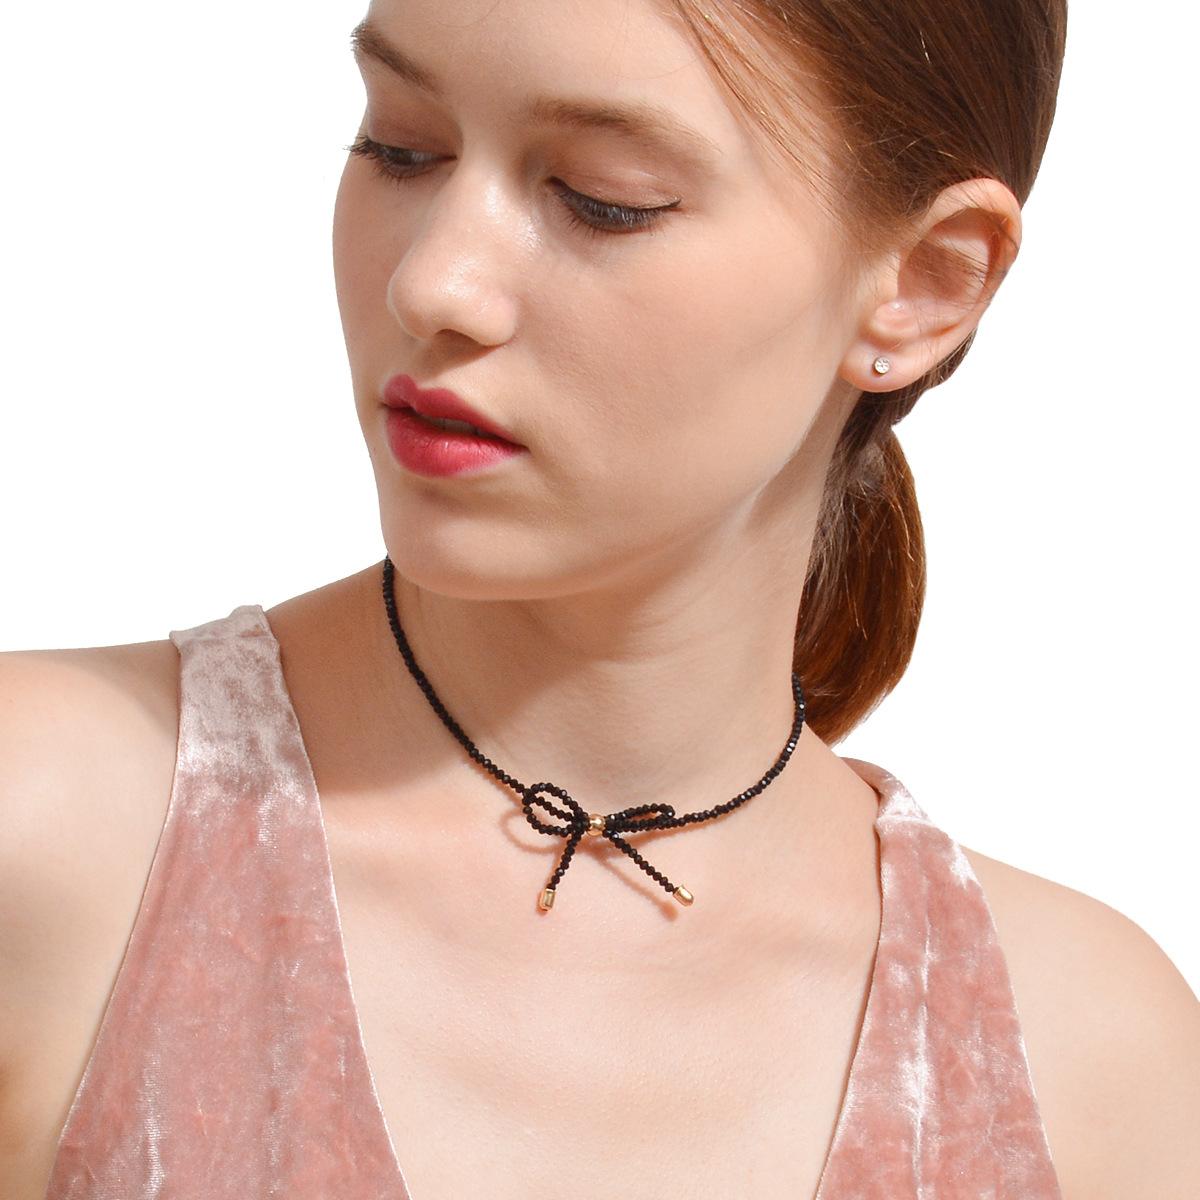 Simple alloy plating Necklace (C2188 black)NHXR1478-C2188 black